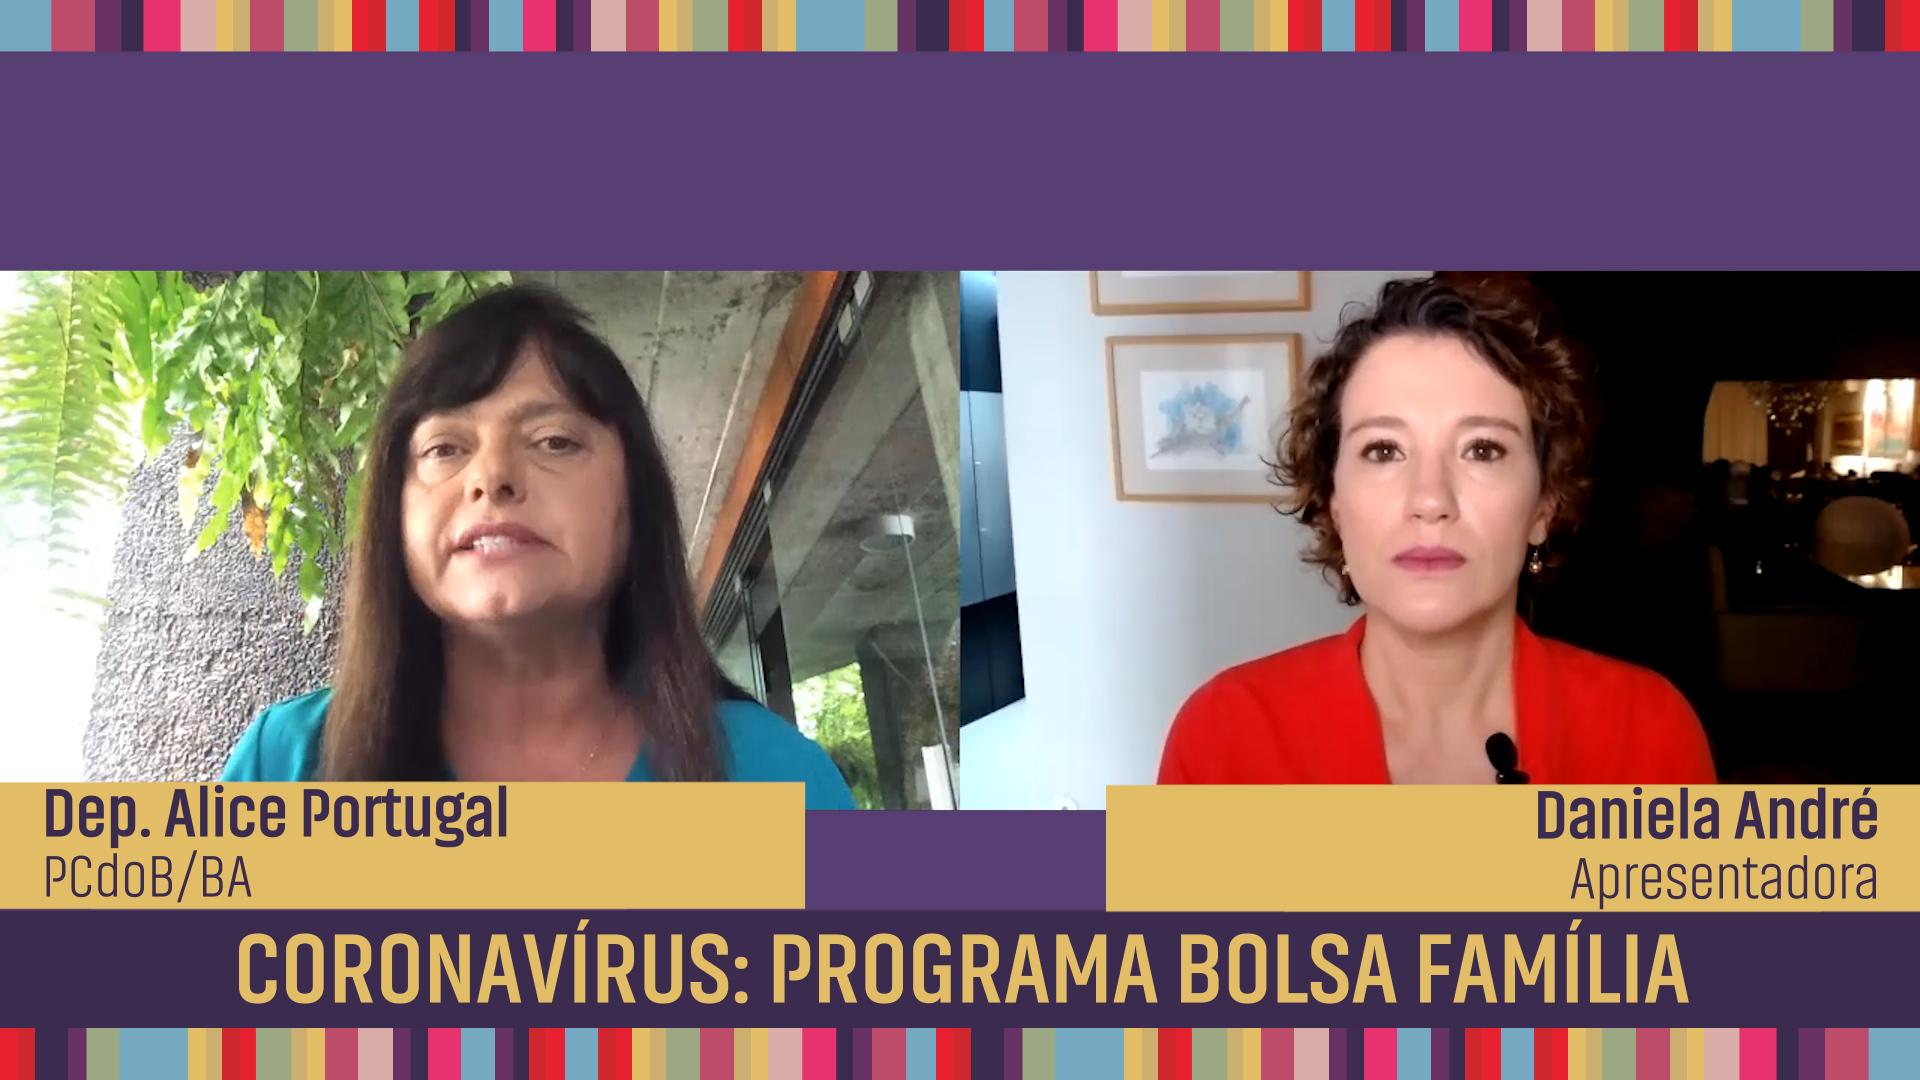 Coronavírus: Programa Bolsa Família